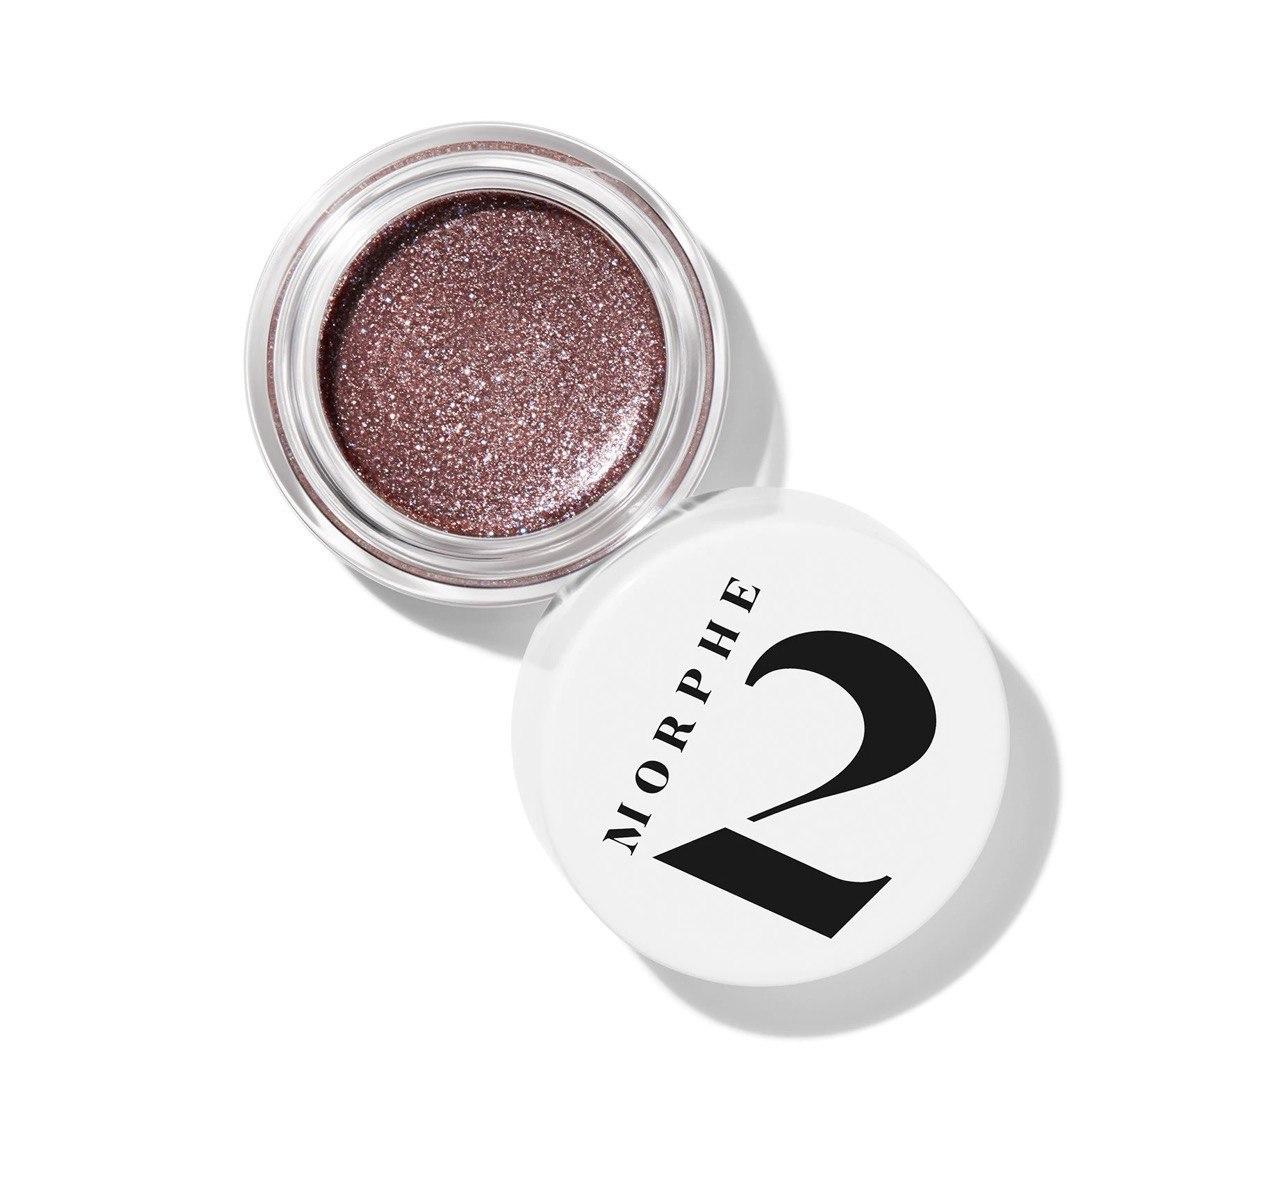 Тени кремовые Morphe 2 Jelly Eye Shimmer Confetti